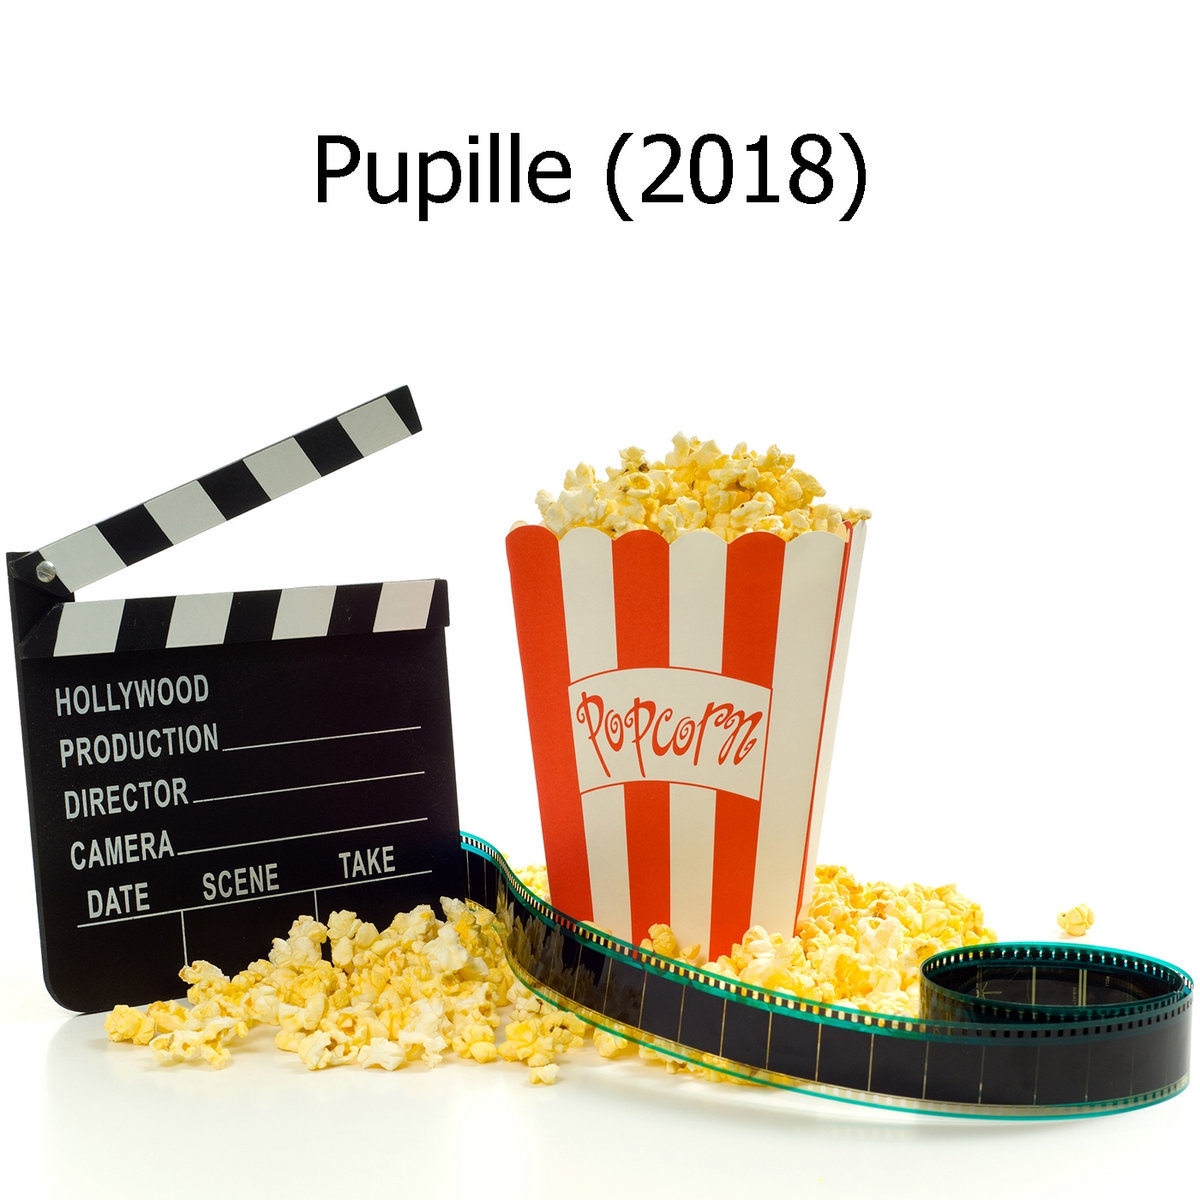 Online Film Hq Pupille 2018 720P (Notebook)   lemtilifospu